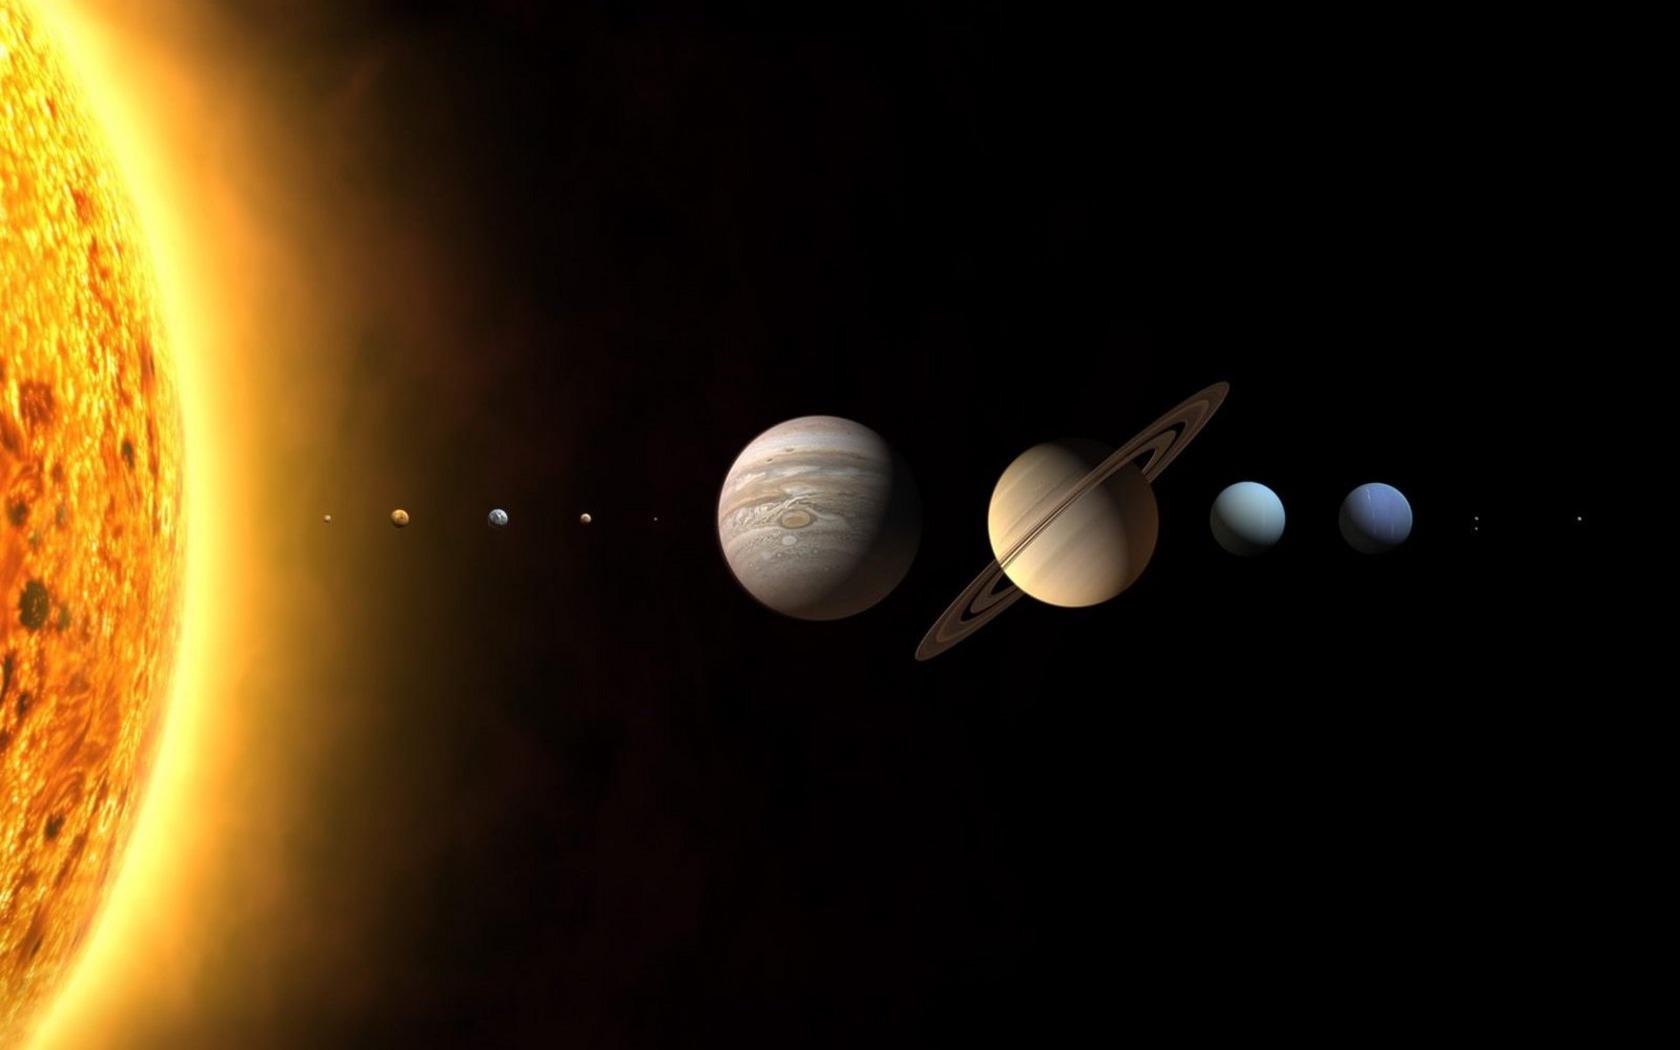 original wallpaper download: Solar System Planets - 1680x1050